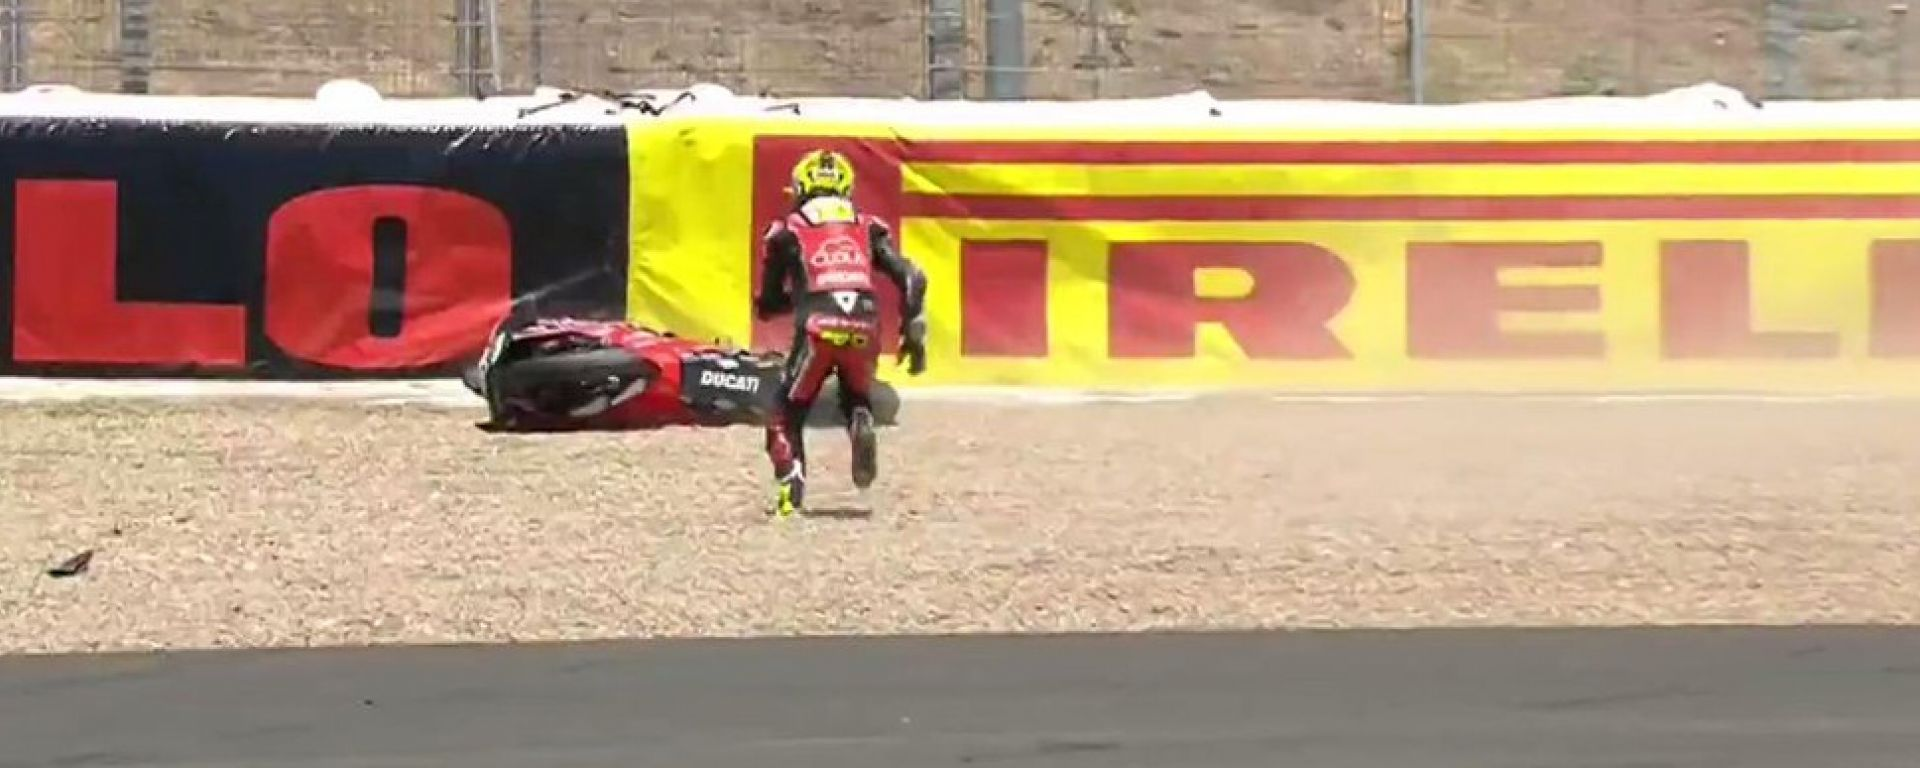 Superbike Jerez: Bautista fa 13 ma cade in gara-2. Rea accorcia